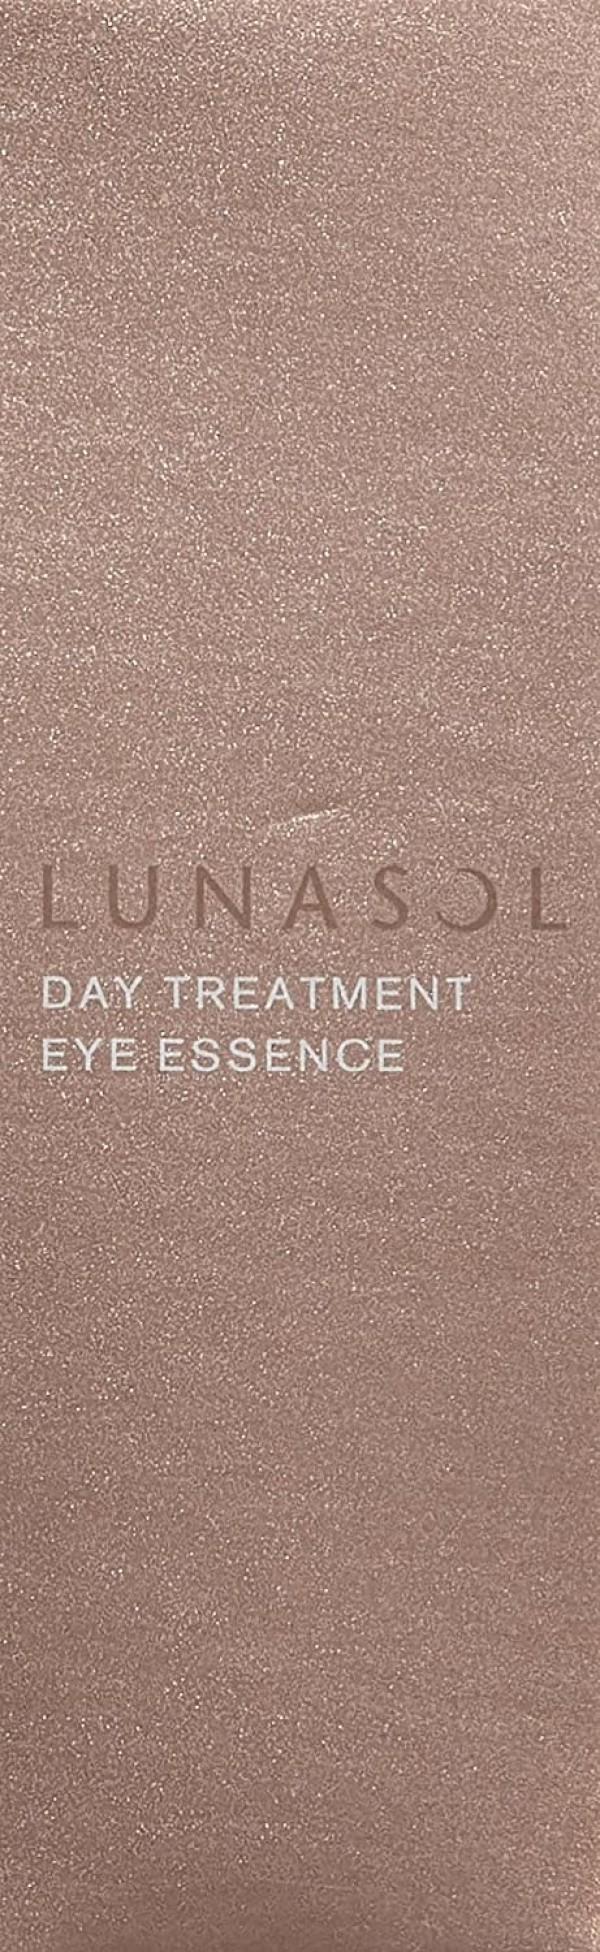 Увлажняющая эссенция для глаз LUNASOL DAY TREATMENT EYE ESSENCE